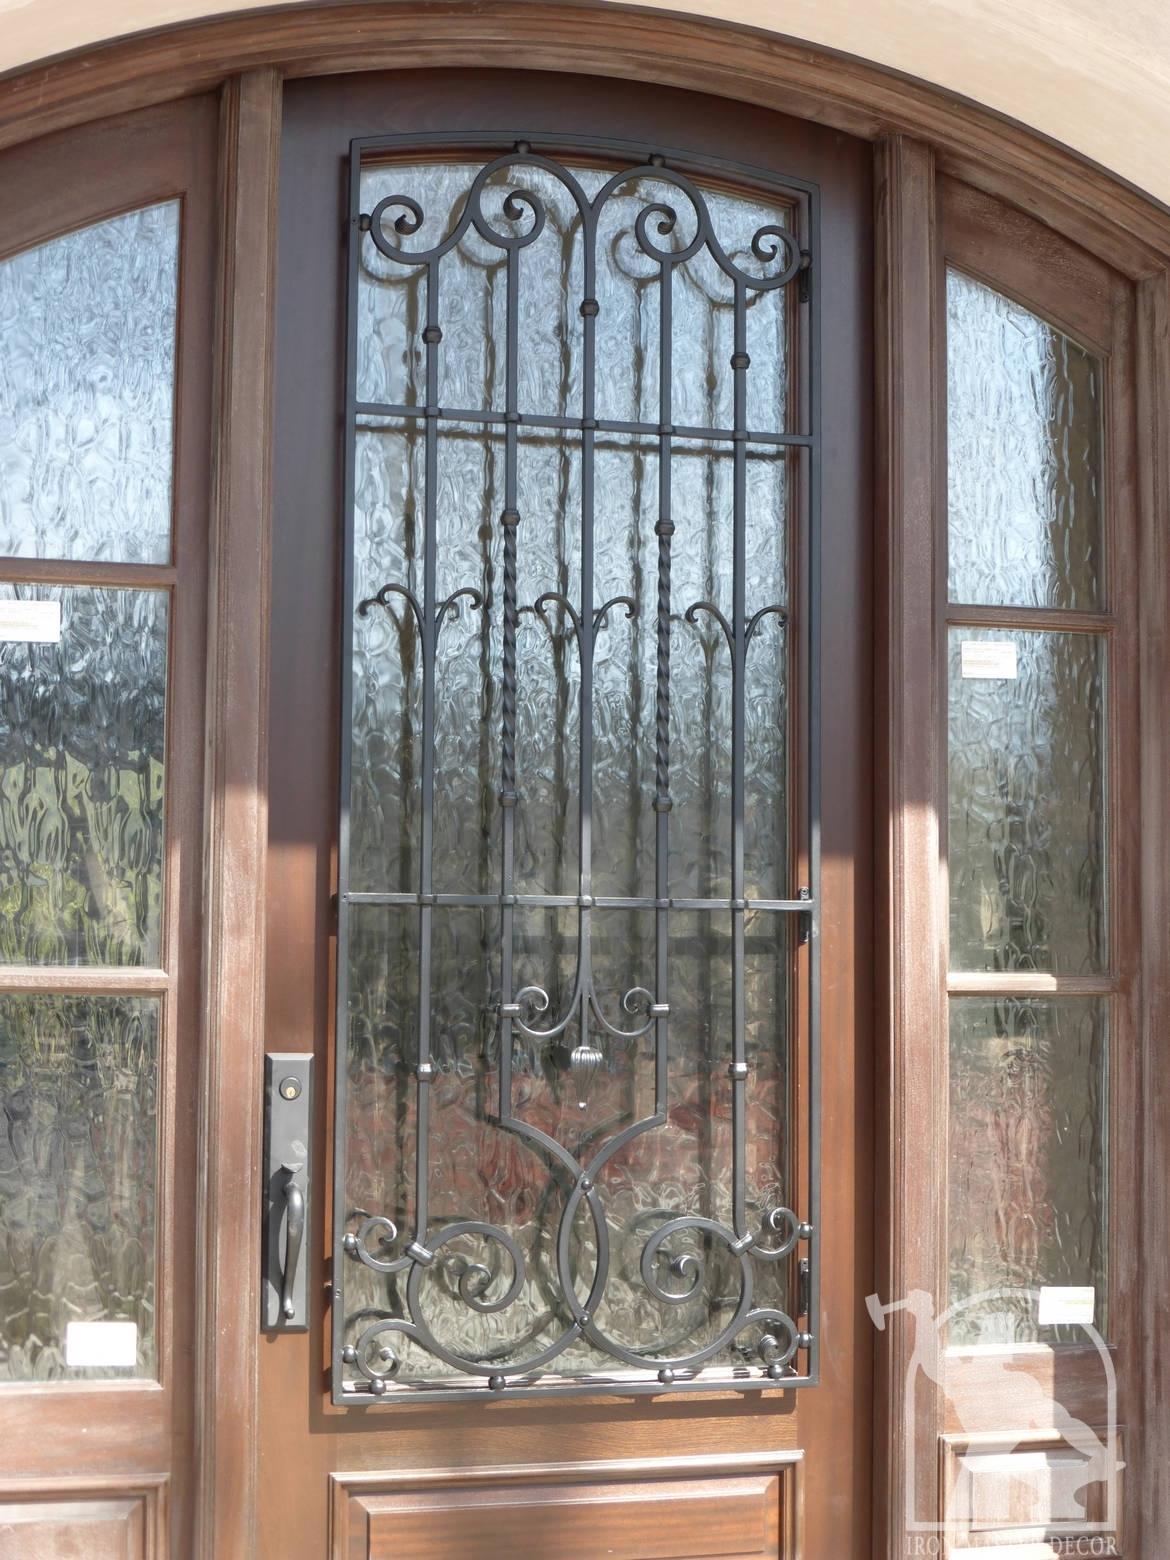 1560 #865D45 Interior Railings Exterior Railings Front Doors Fences Gates  picture/photo Rod Iron Front Doors 43091170